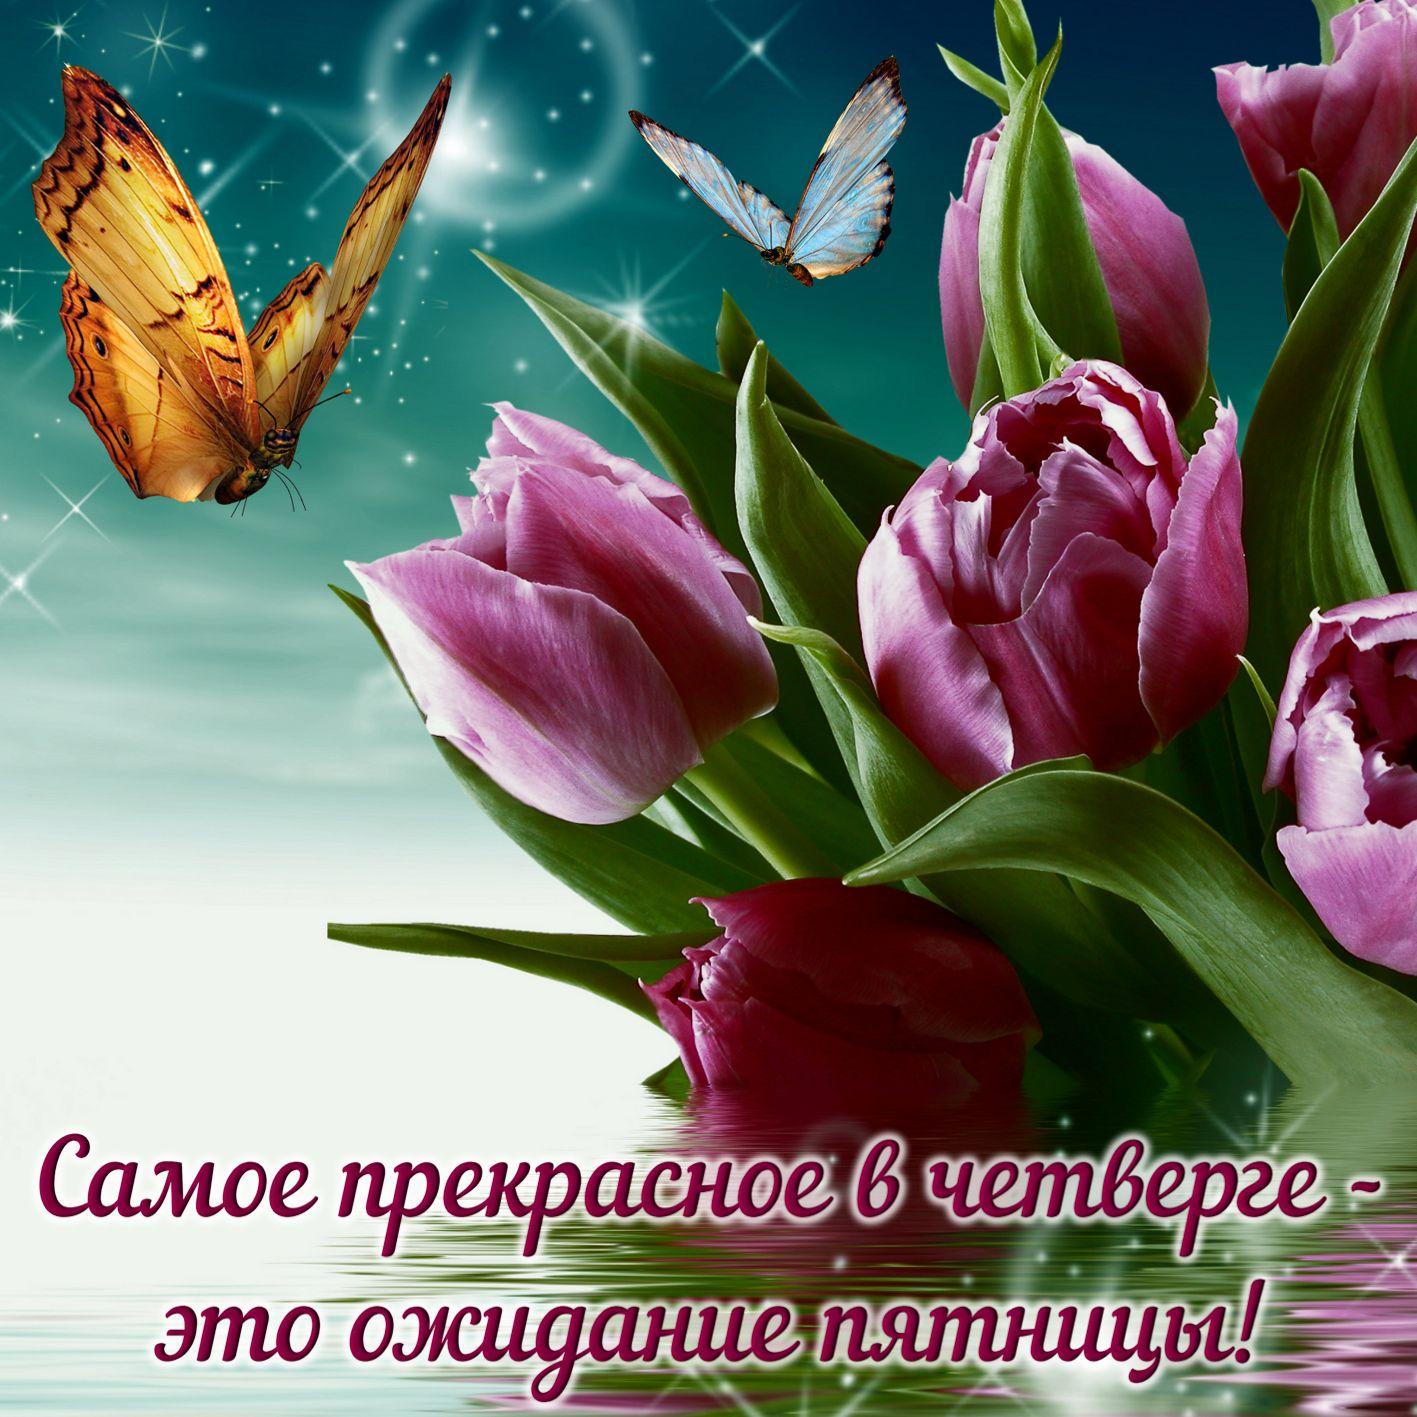 Открытка с тюльпанами на красивом фоне на четверг